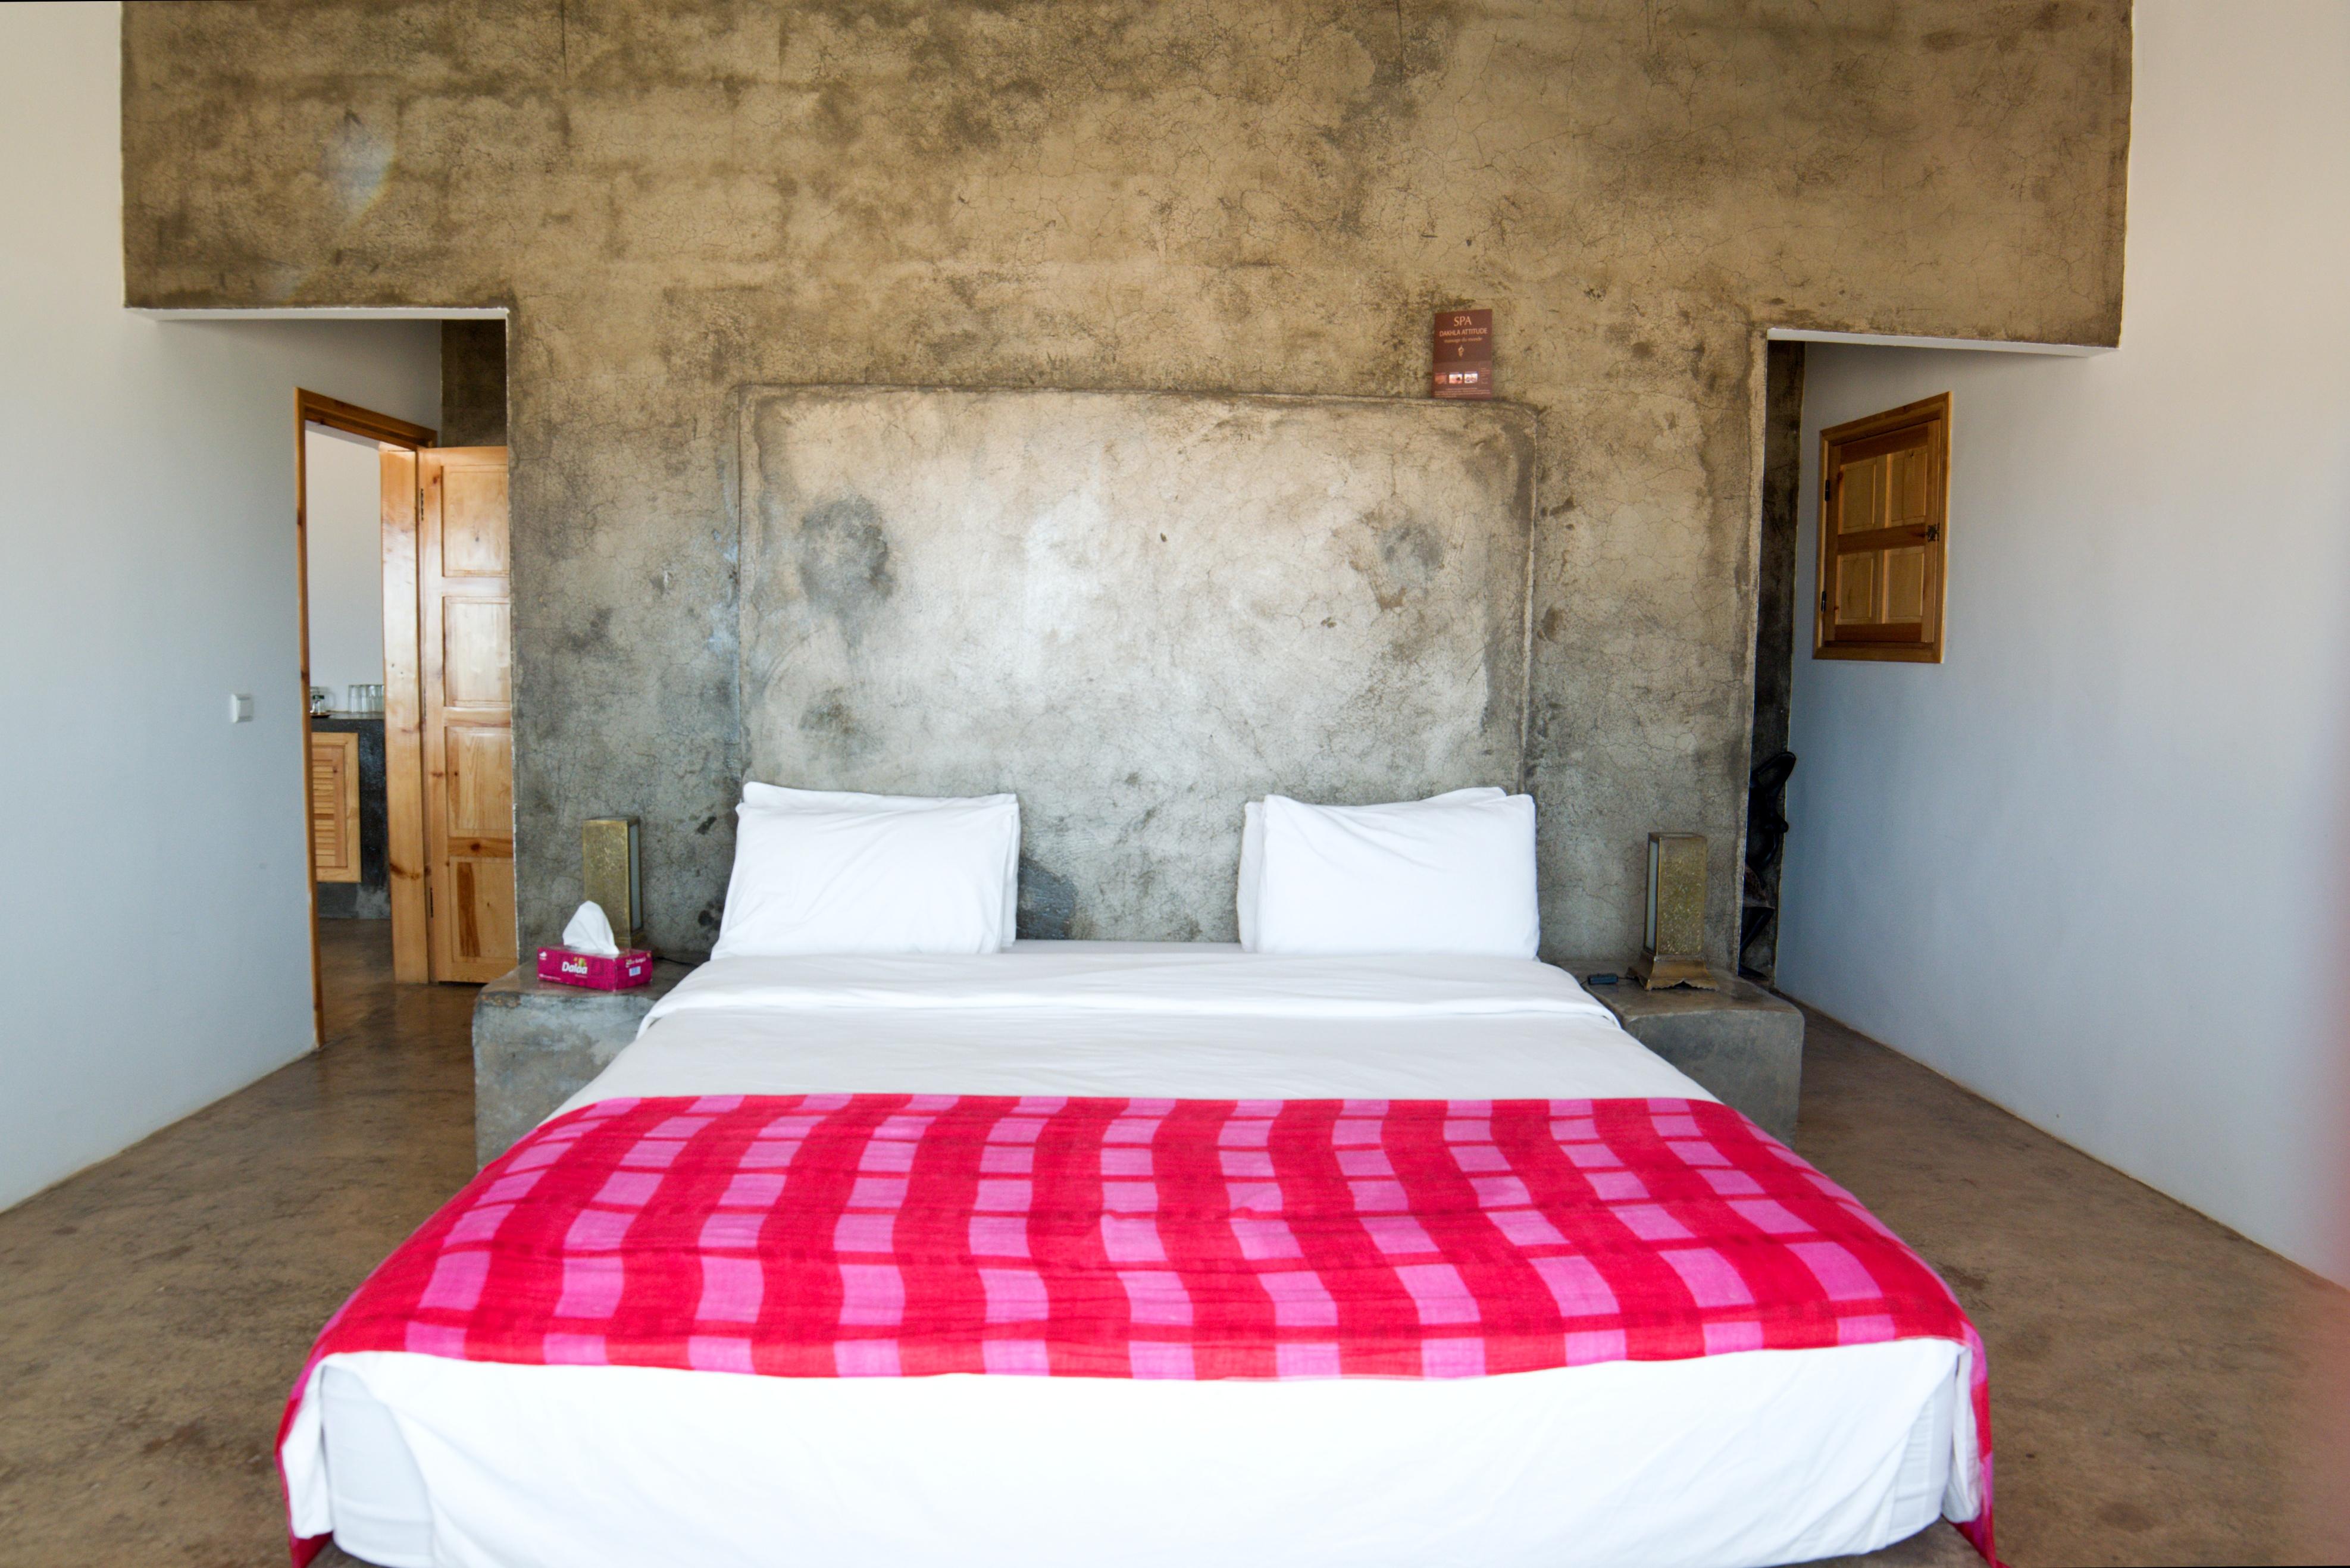 Dakhla attitude VIP luxury boutique hotel camp surf Sahara king-size bed